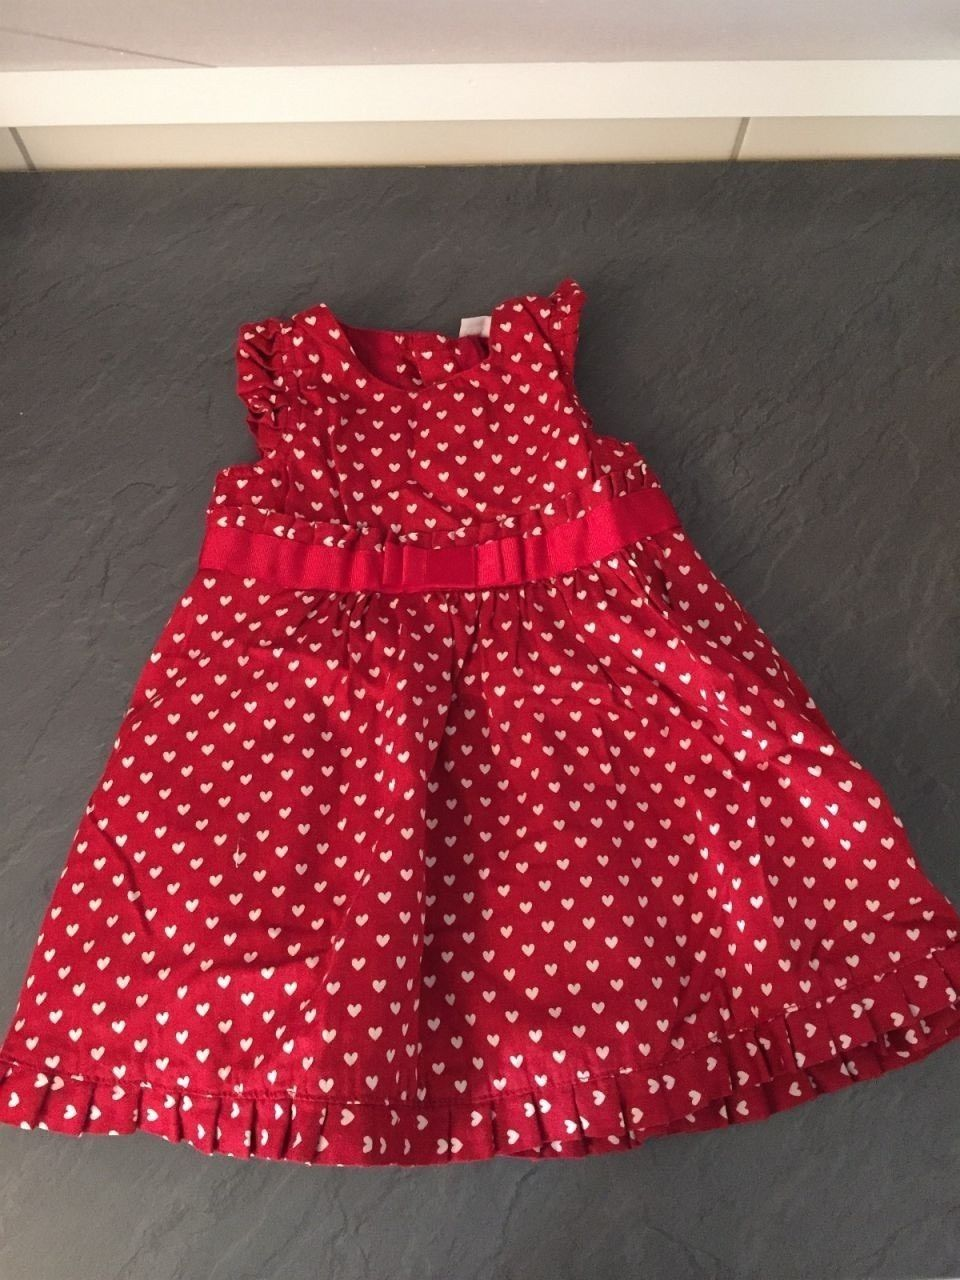 Julekjole? Søt kjole str 80 <3 | FINN.no